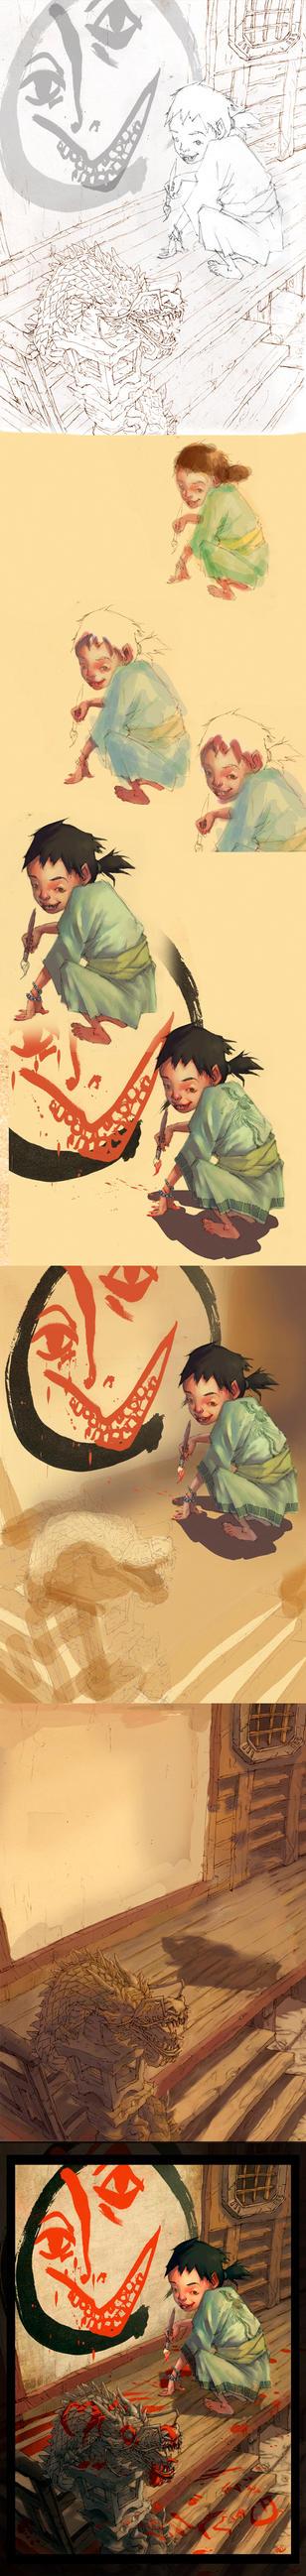 zen painting process by toniinfante